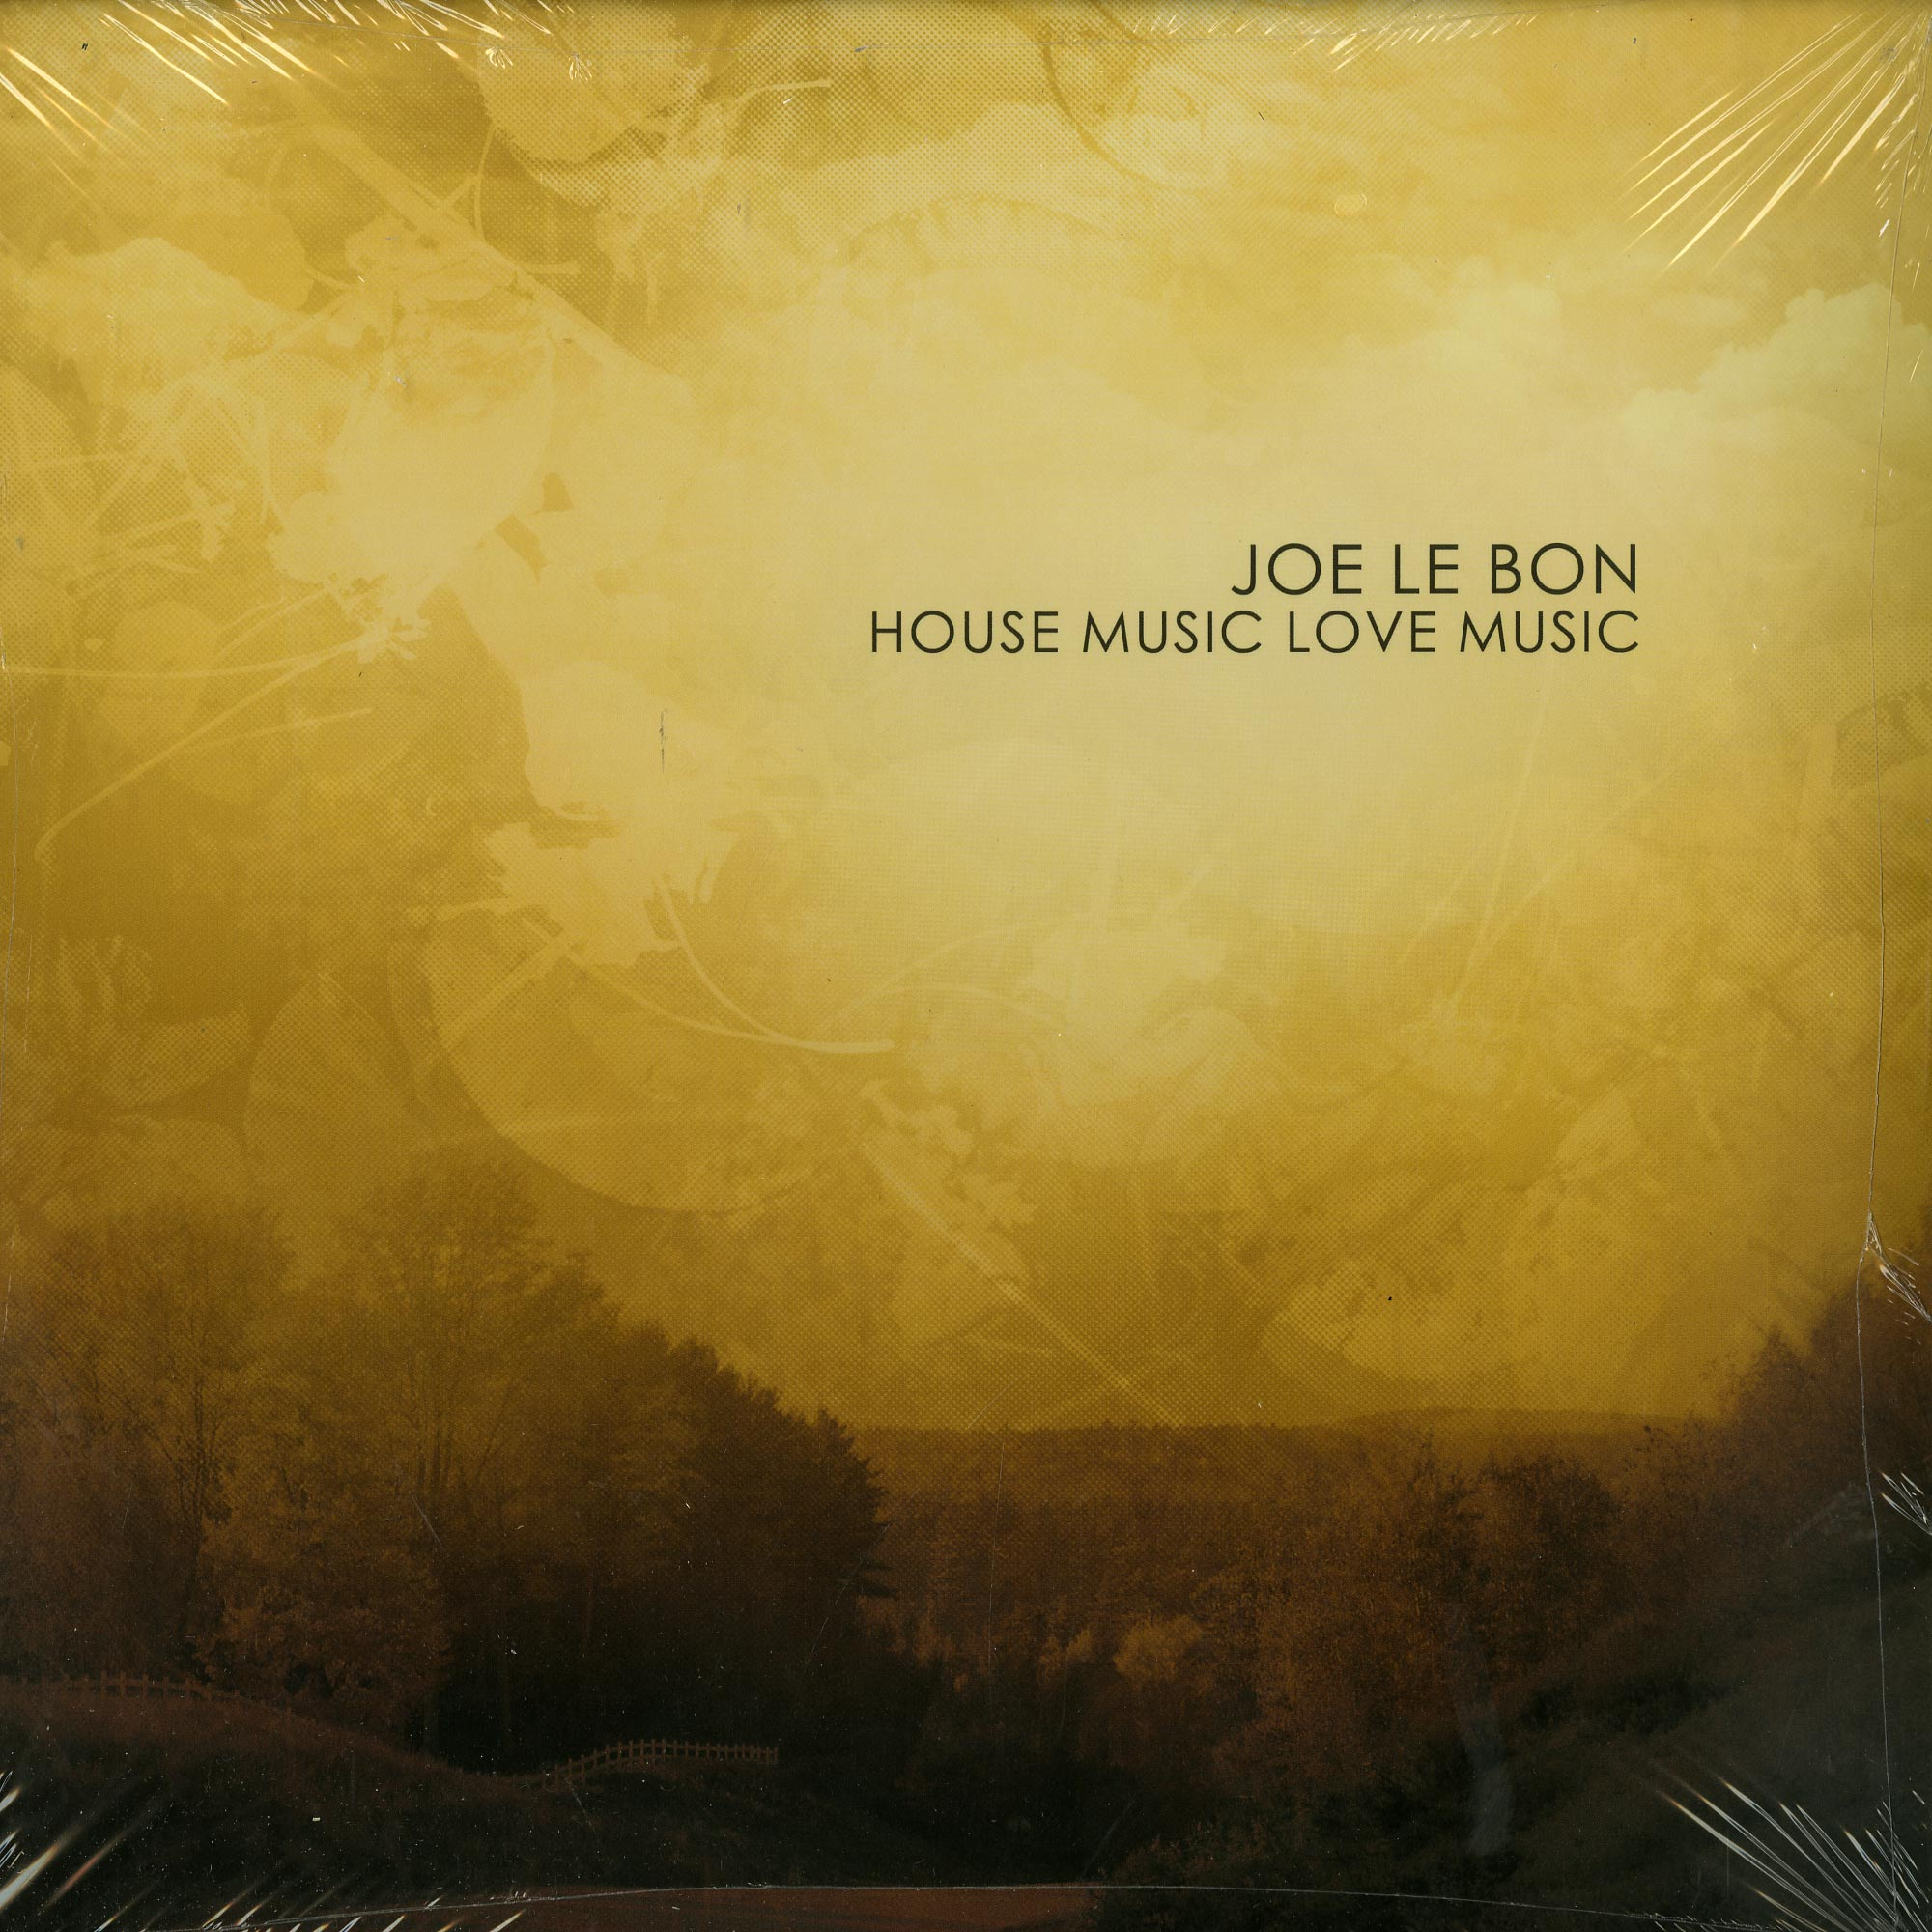 Joe le bon house music love music vinyl shop for House music vinyl